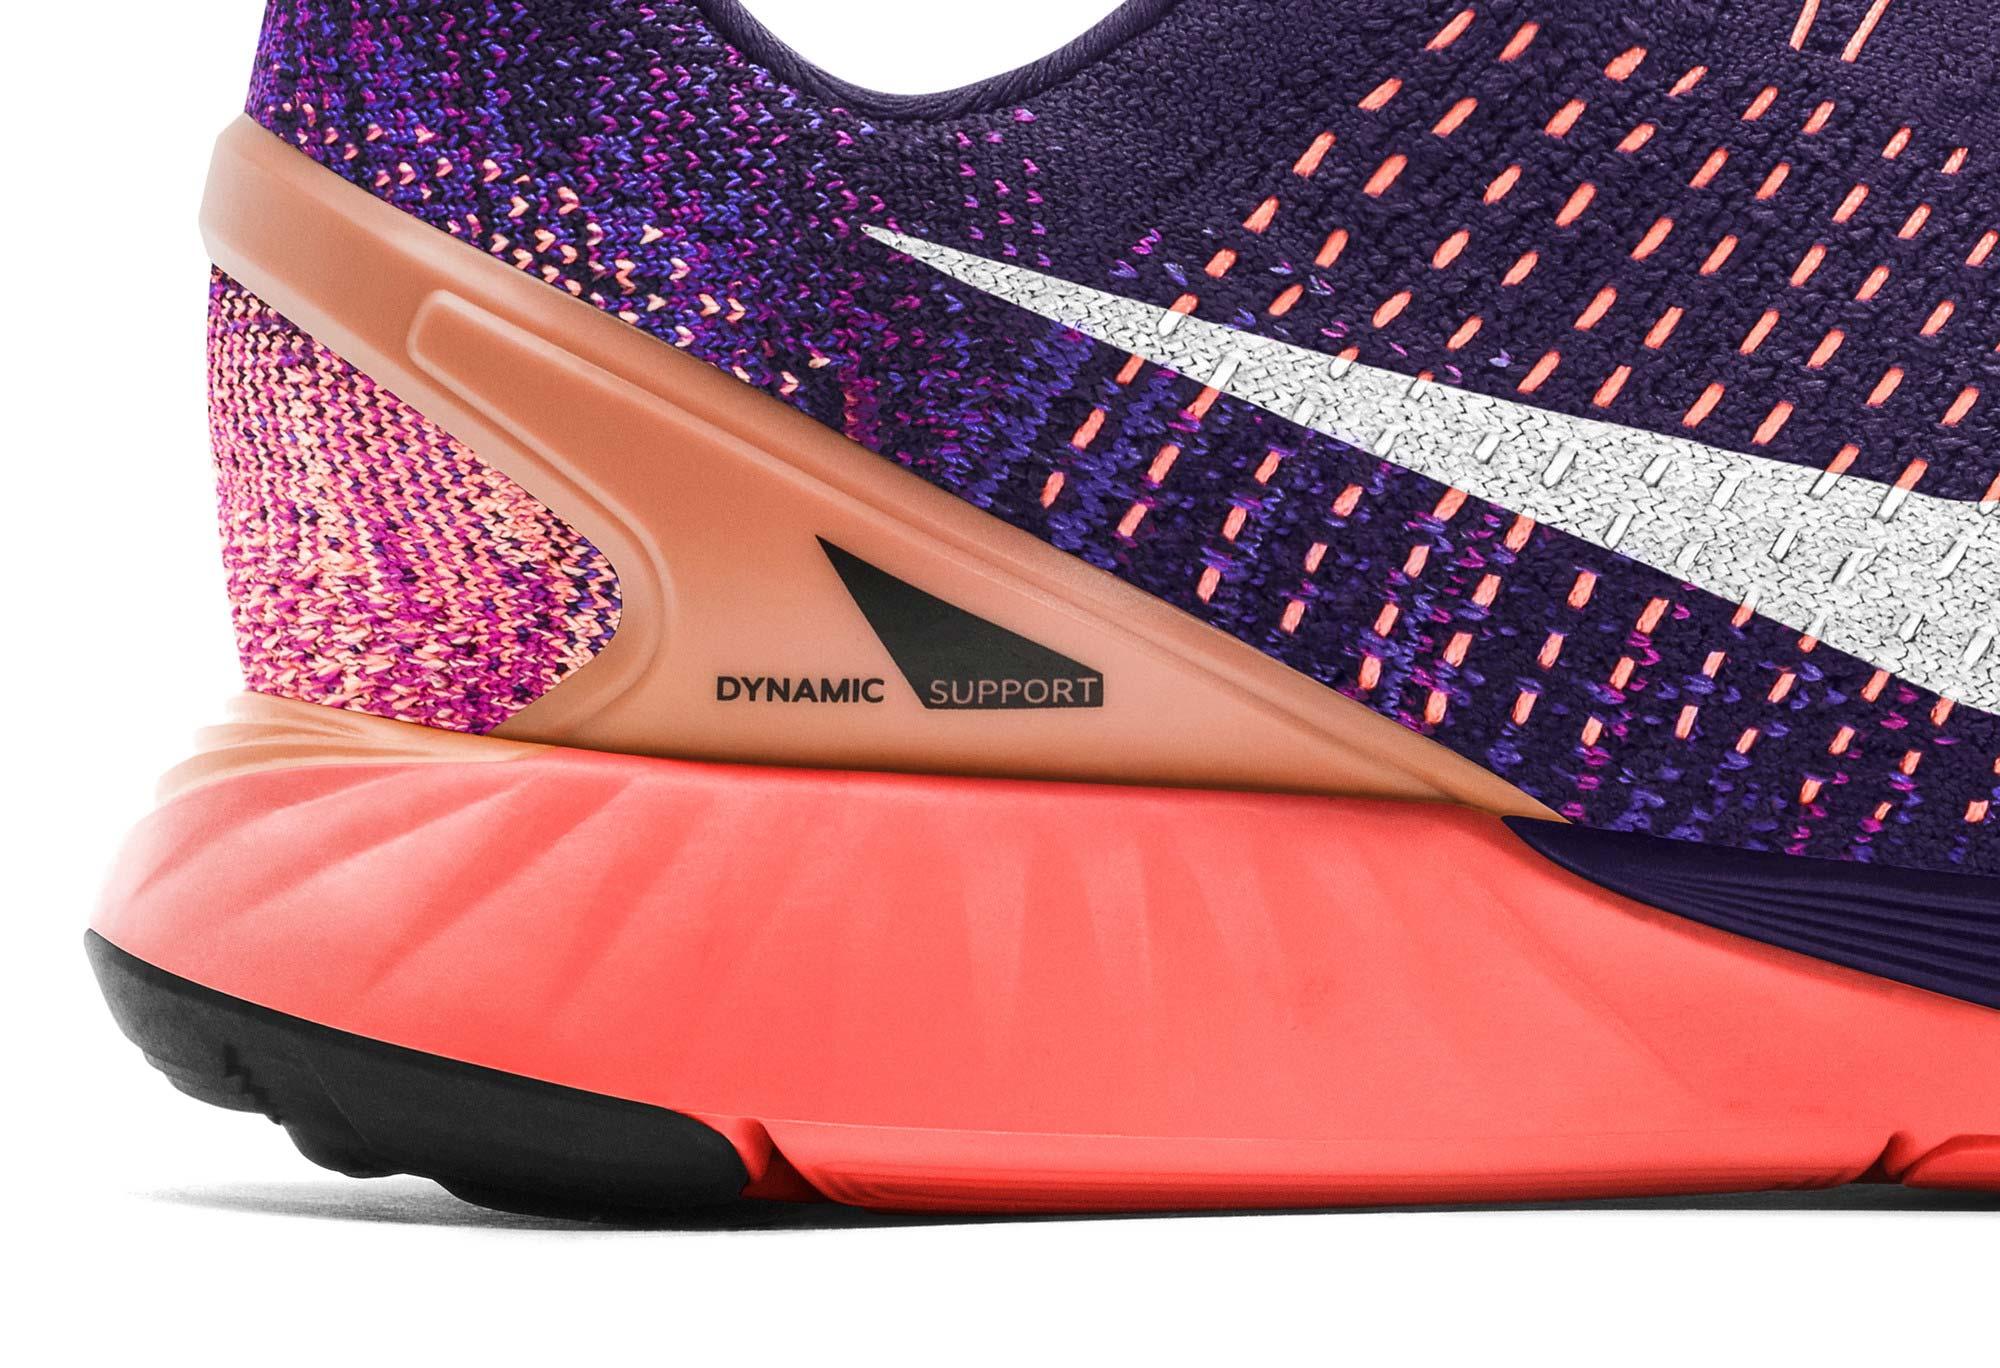 0697ffc141596 ... nike lunarglide 7 australia c306a 6eafc  reduced lunarglide 7 w womens  running shoe 2fe27 69413